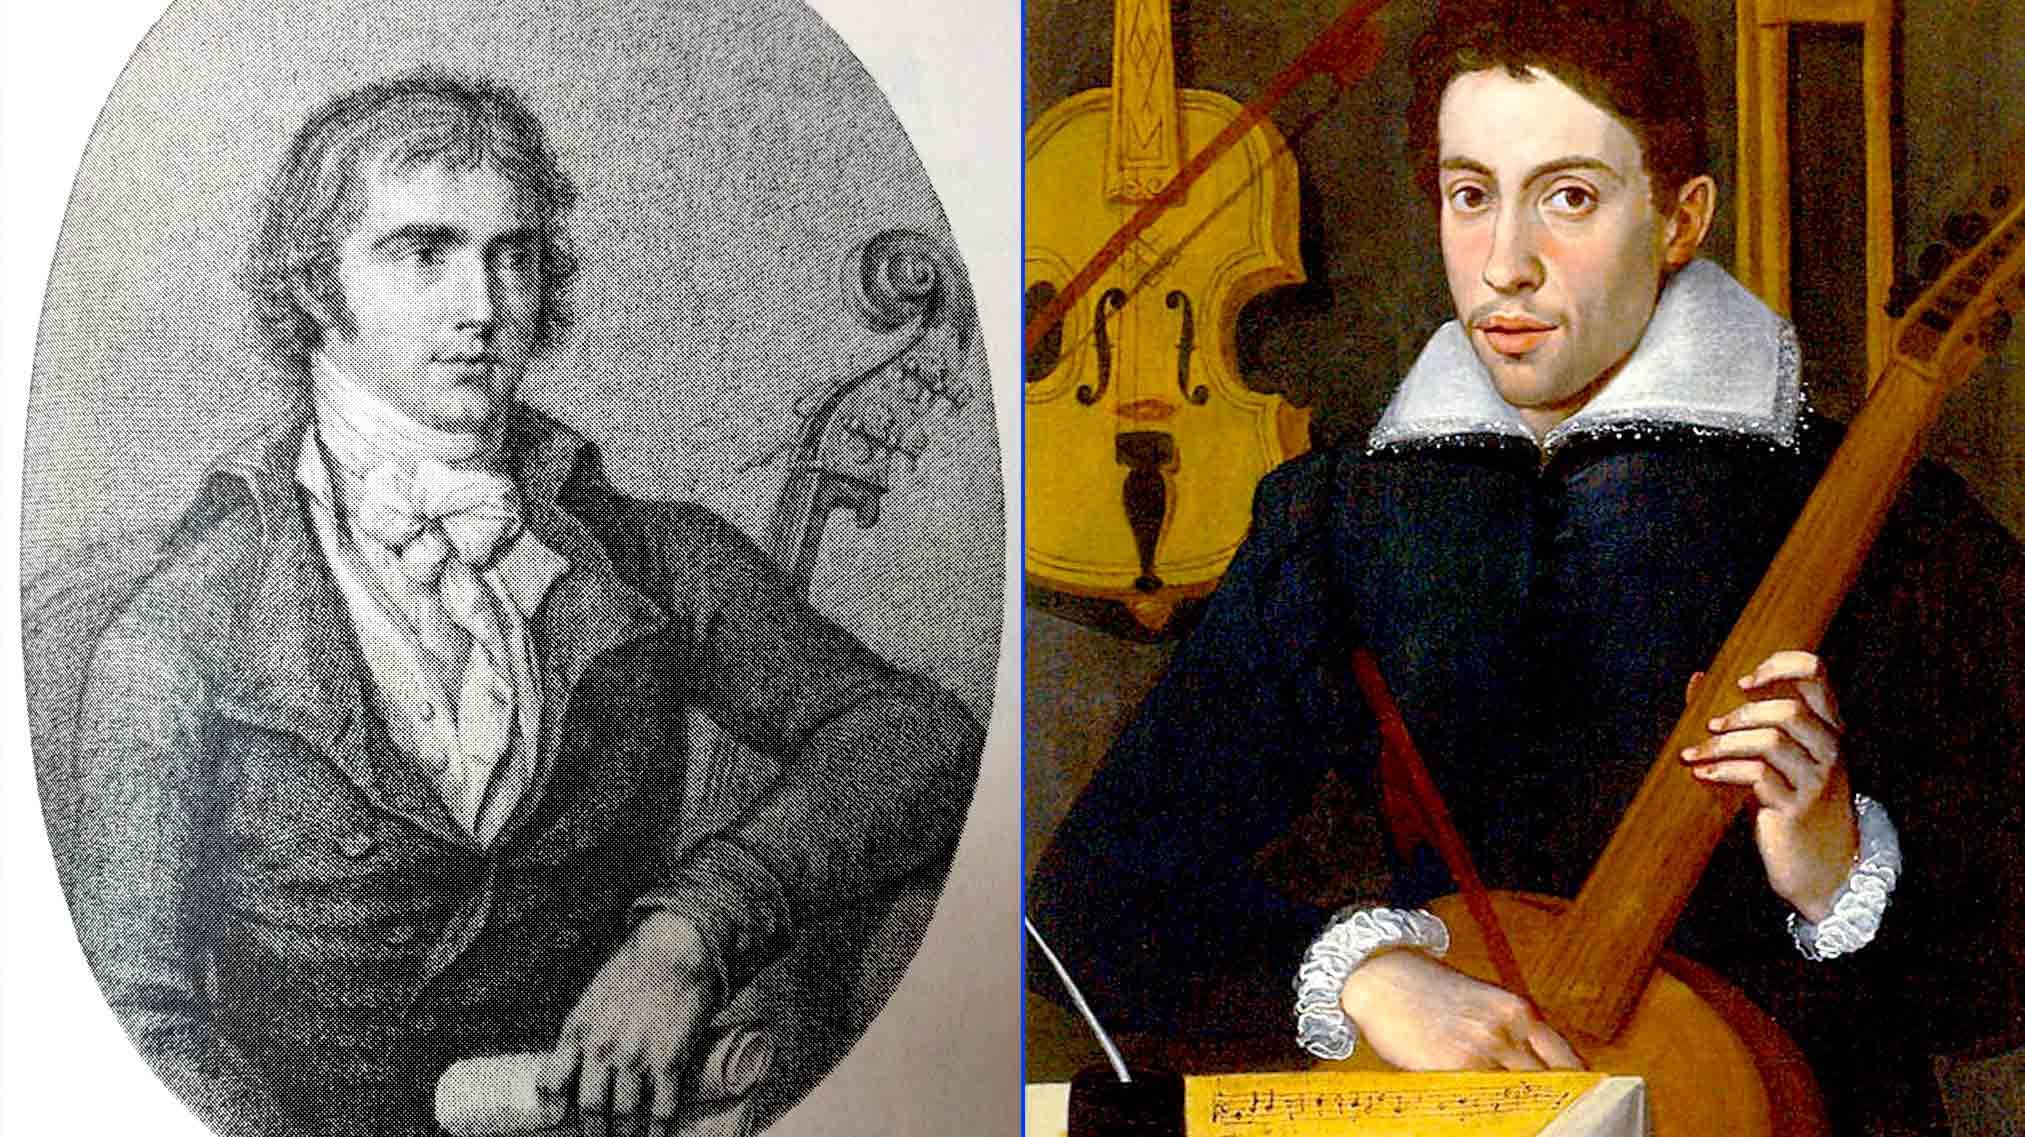 Gasparo Bertolotti y Andrea Amati, padres del violín moderno